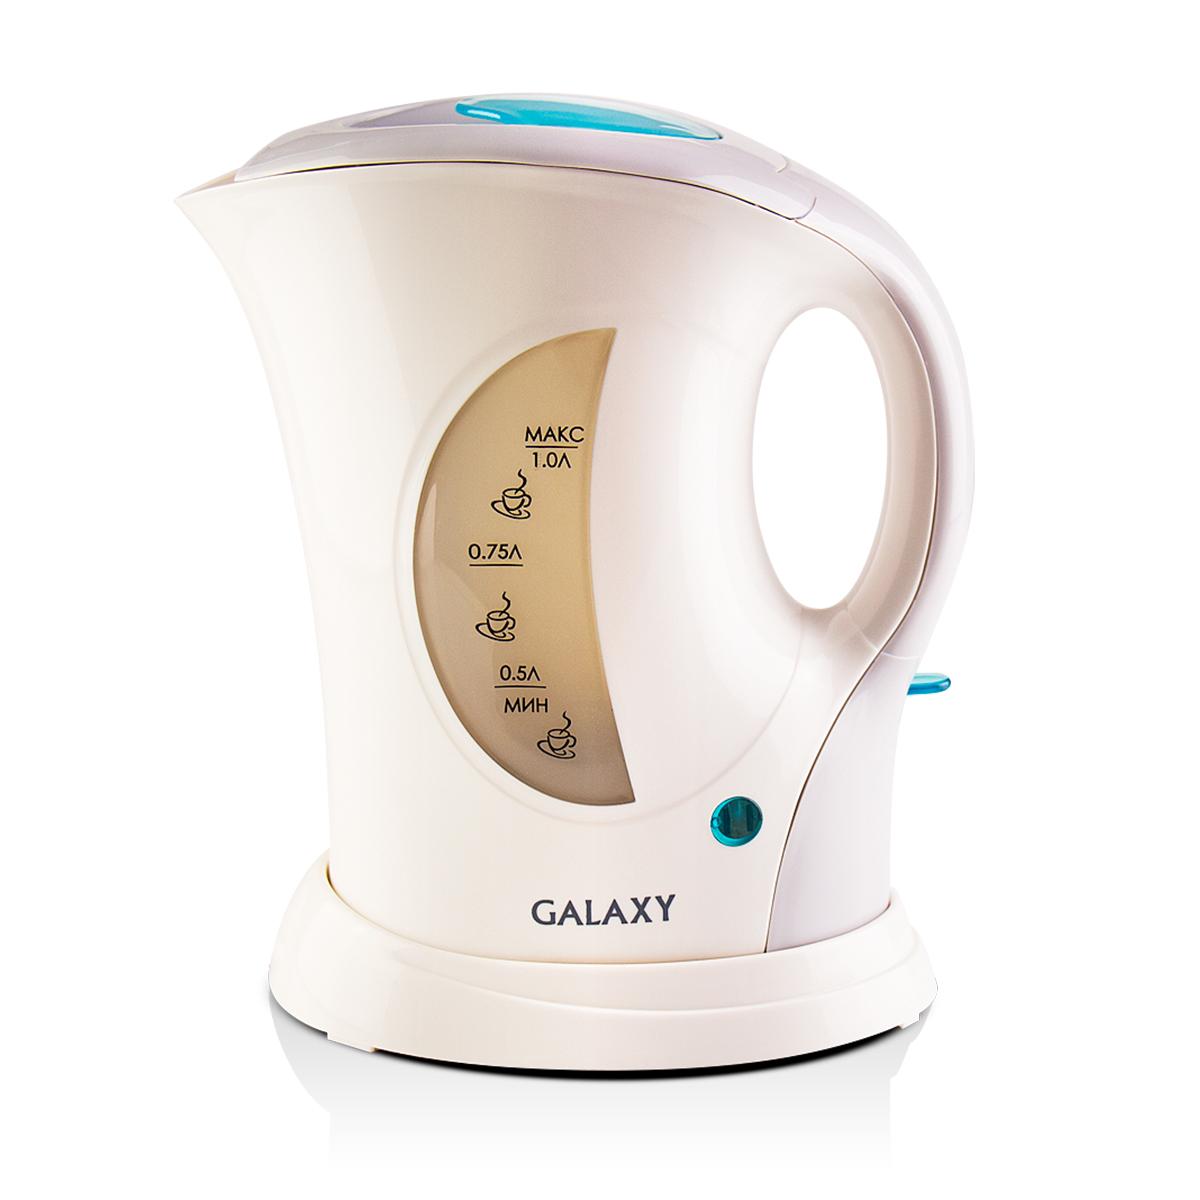 Galaxy GL 0105, White чайник электрический ( 4630003363268 )